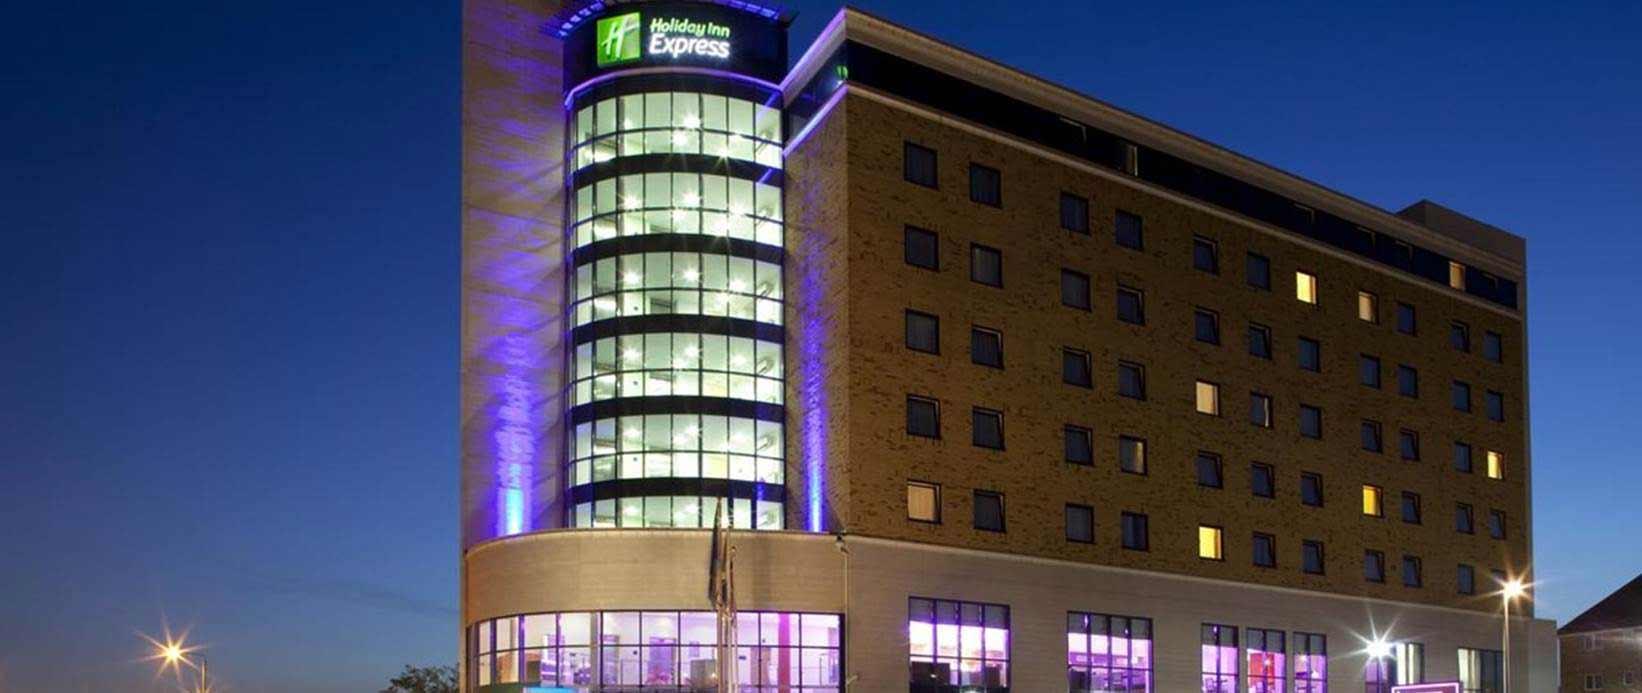 HotelPartner